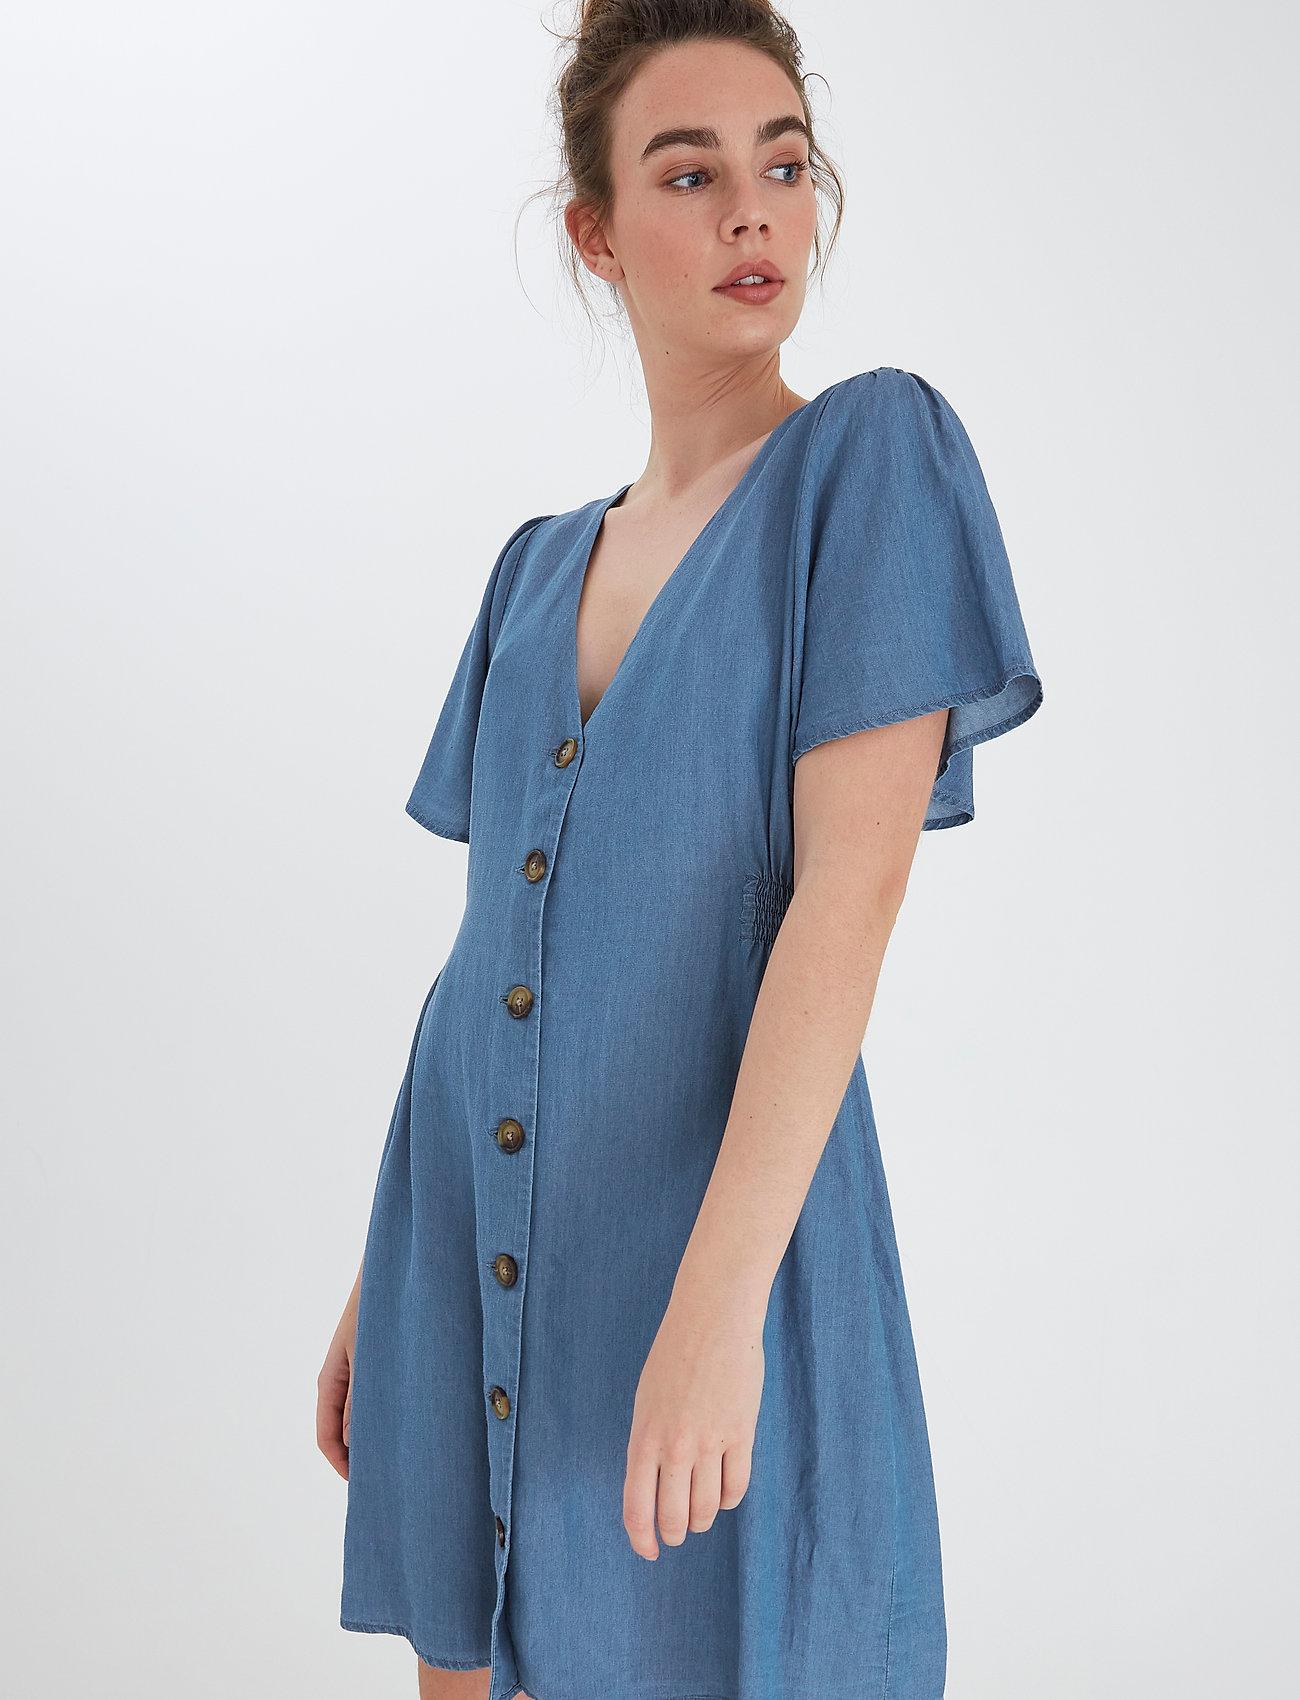 ICHI - IHLAMBREY DR3 - summer dresses - medium blue - 3